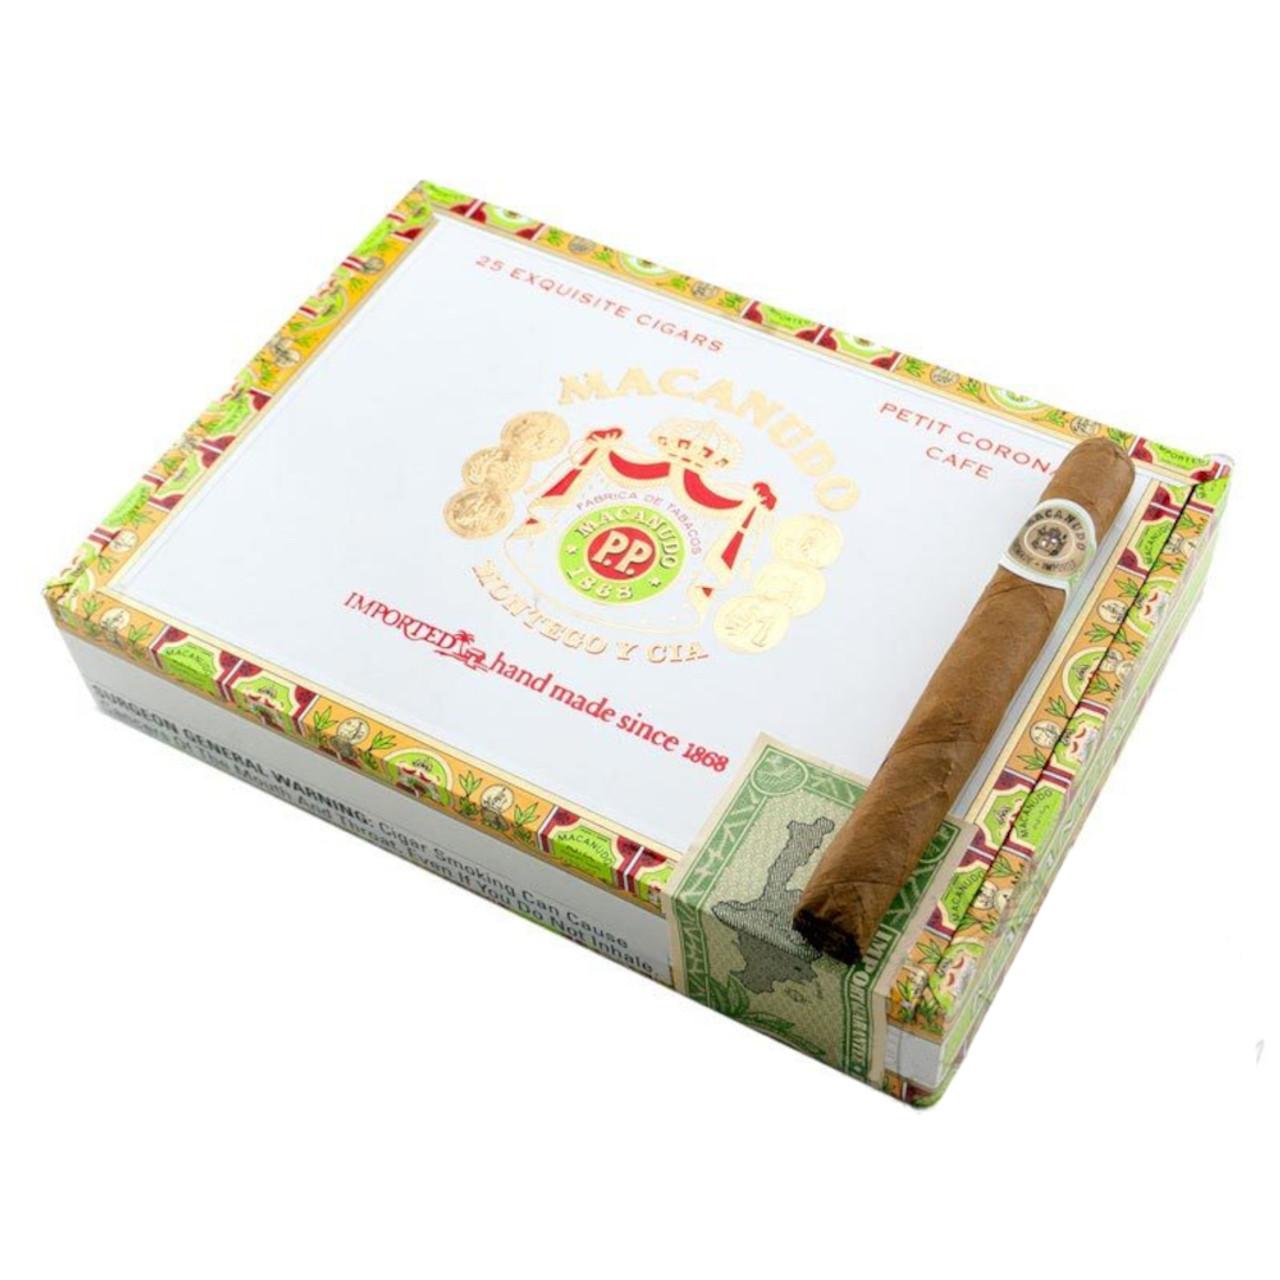 Macanudo Petit Corona Cigars - 5 x 38 (Box of 25)